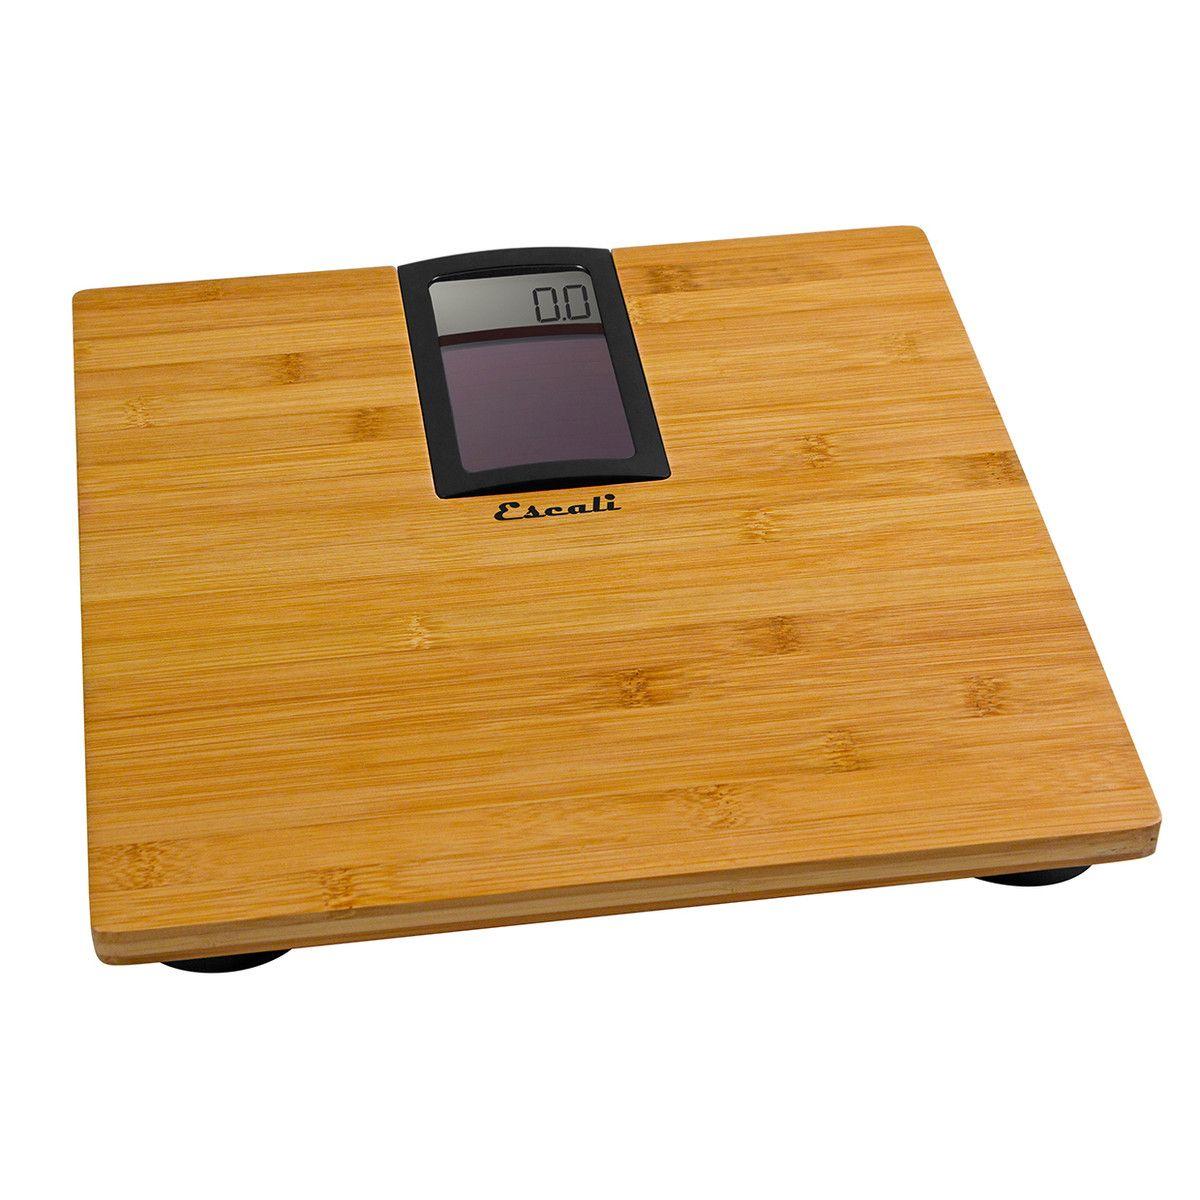 180 Solar Bath Scale | Bath scale, Bathroom scale, Bamboo ...